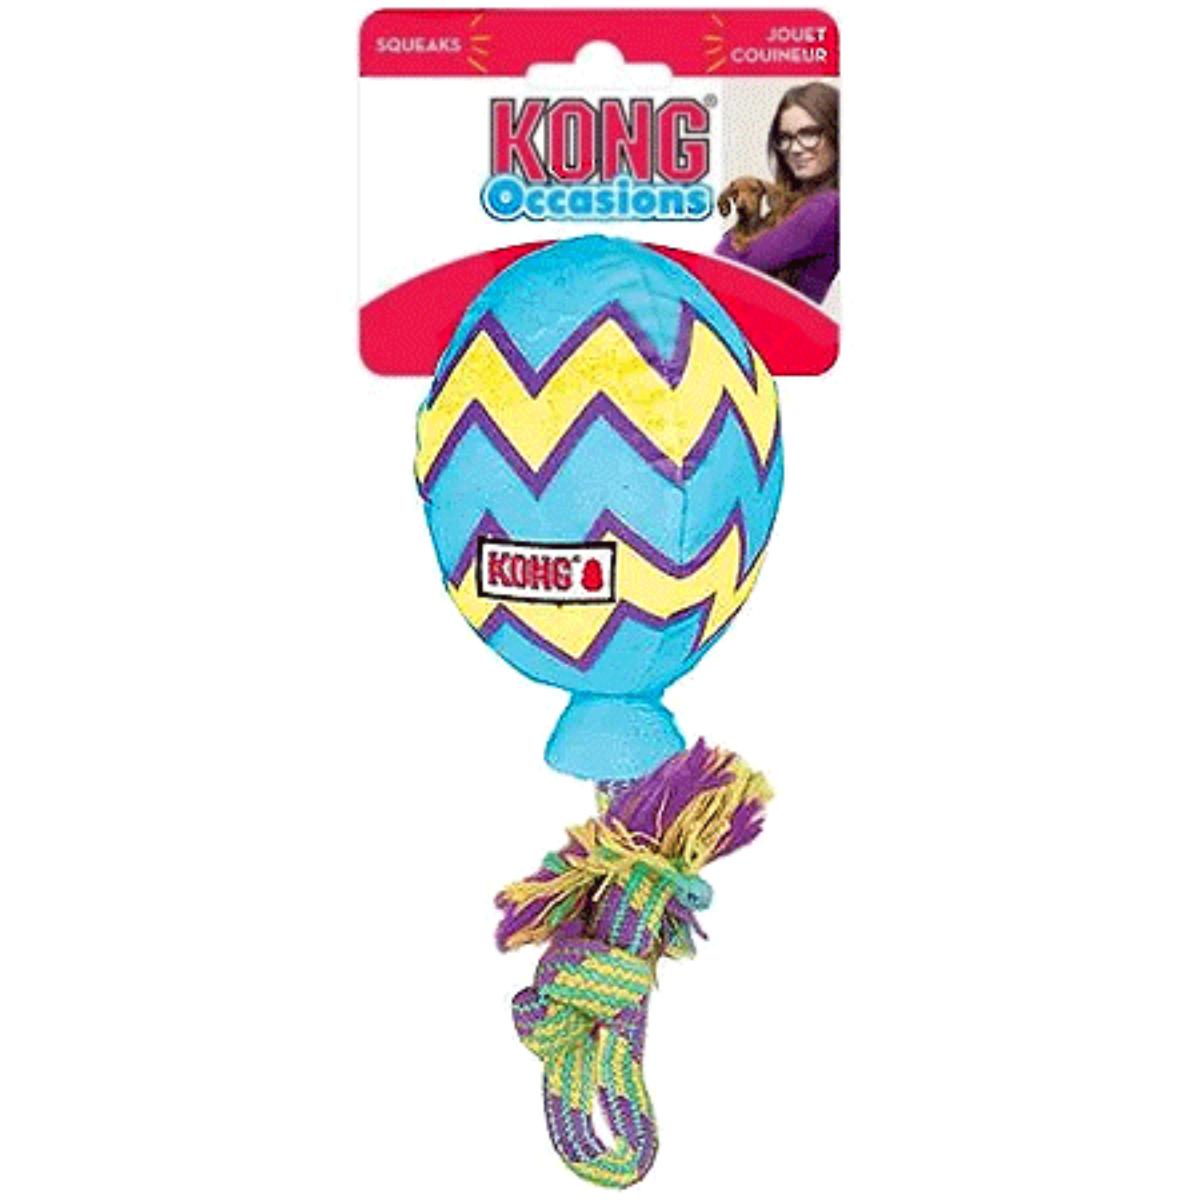 KONG Spring Occasions Balloon